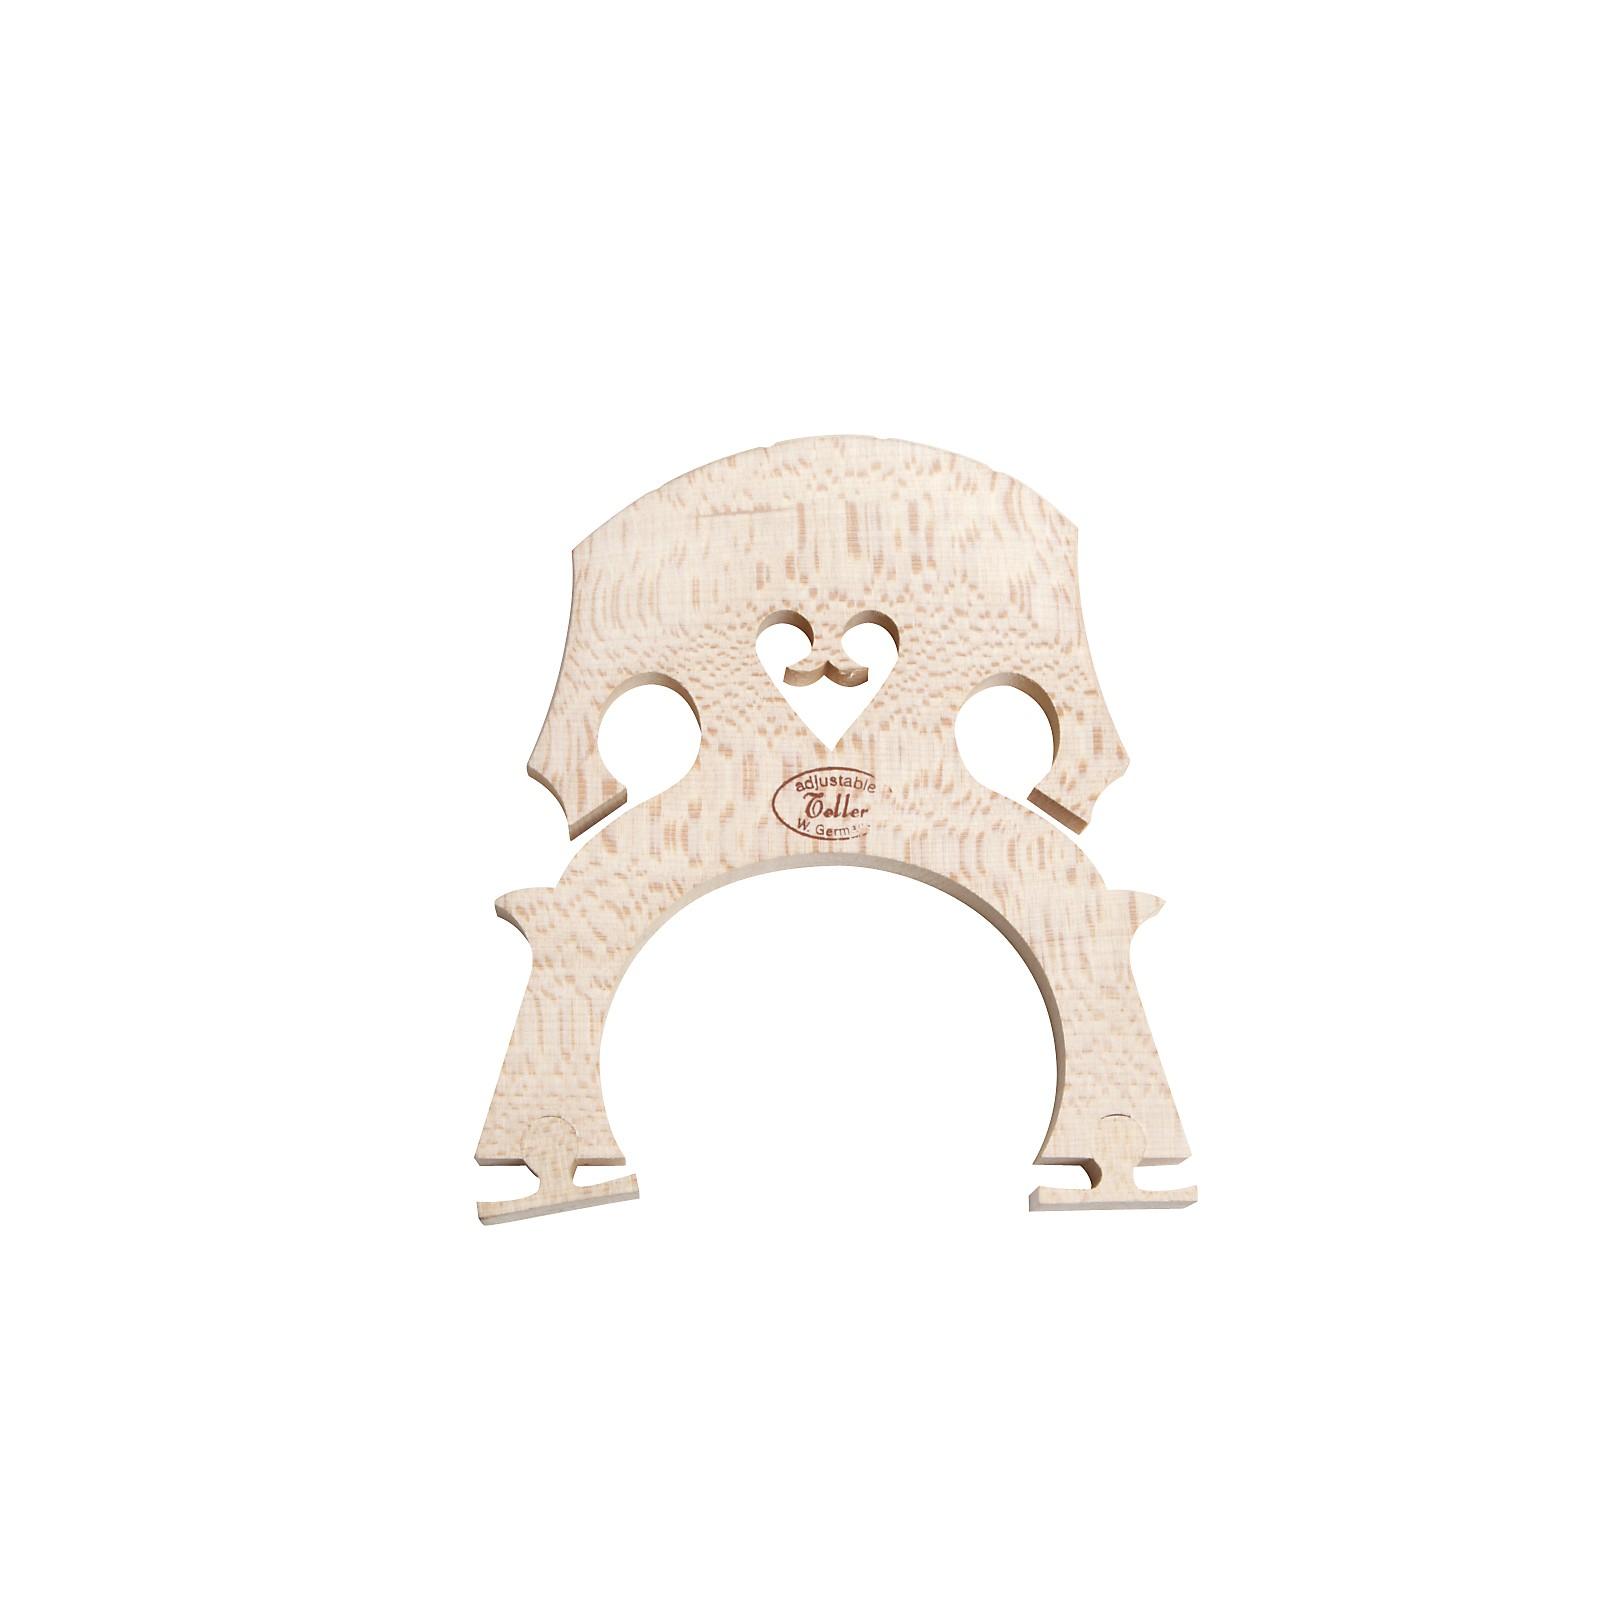 Florea Adjustable Cello Bridge